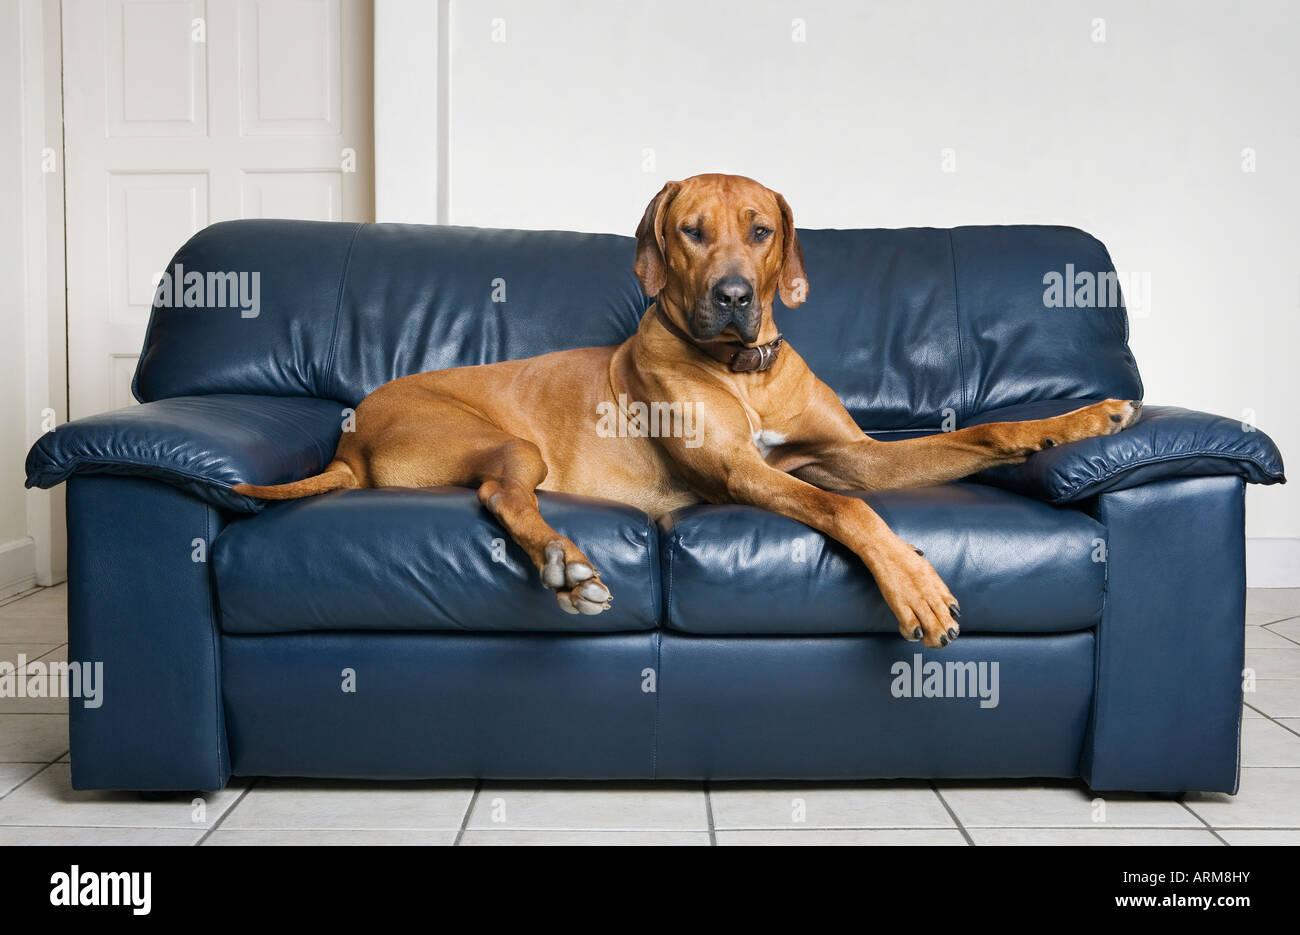 Rhodesian Ridge zurück Hund auf sofa Stockbild